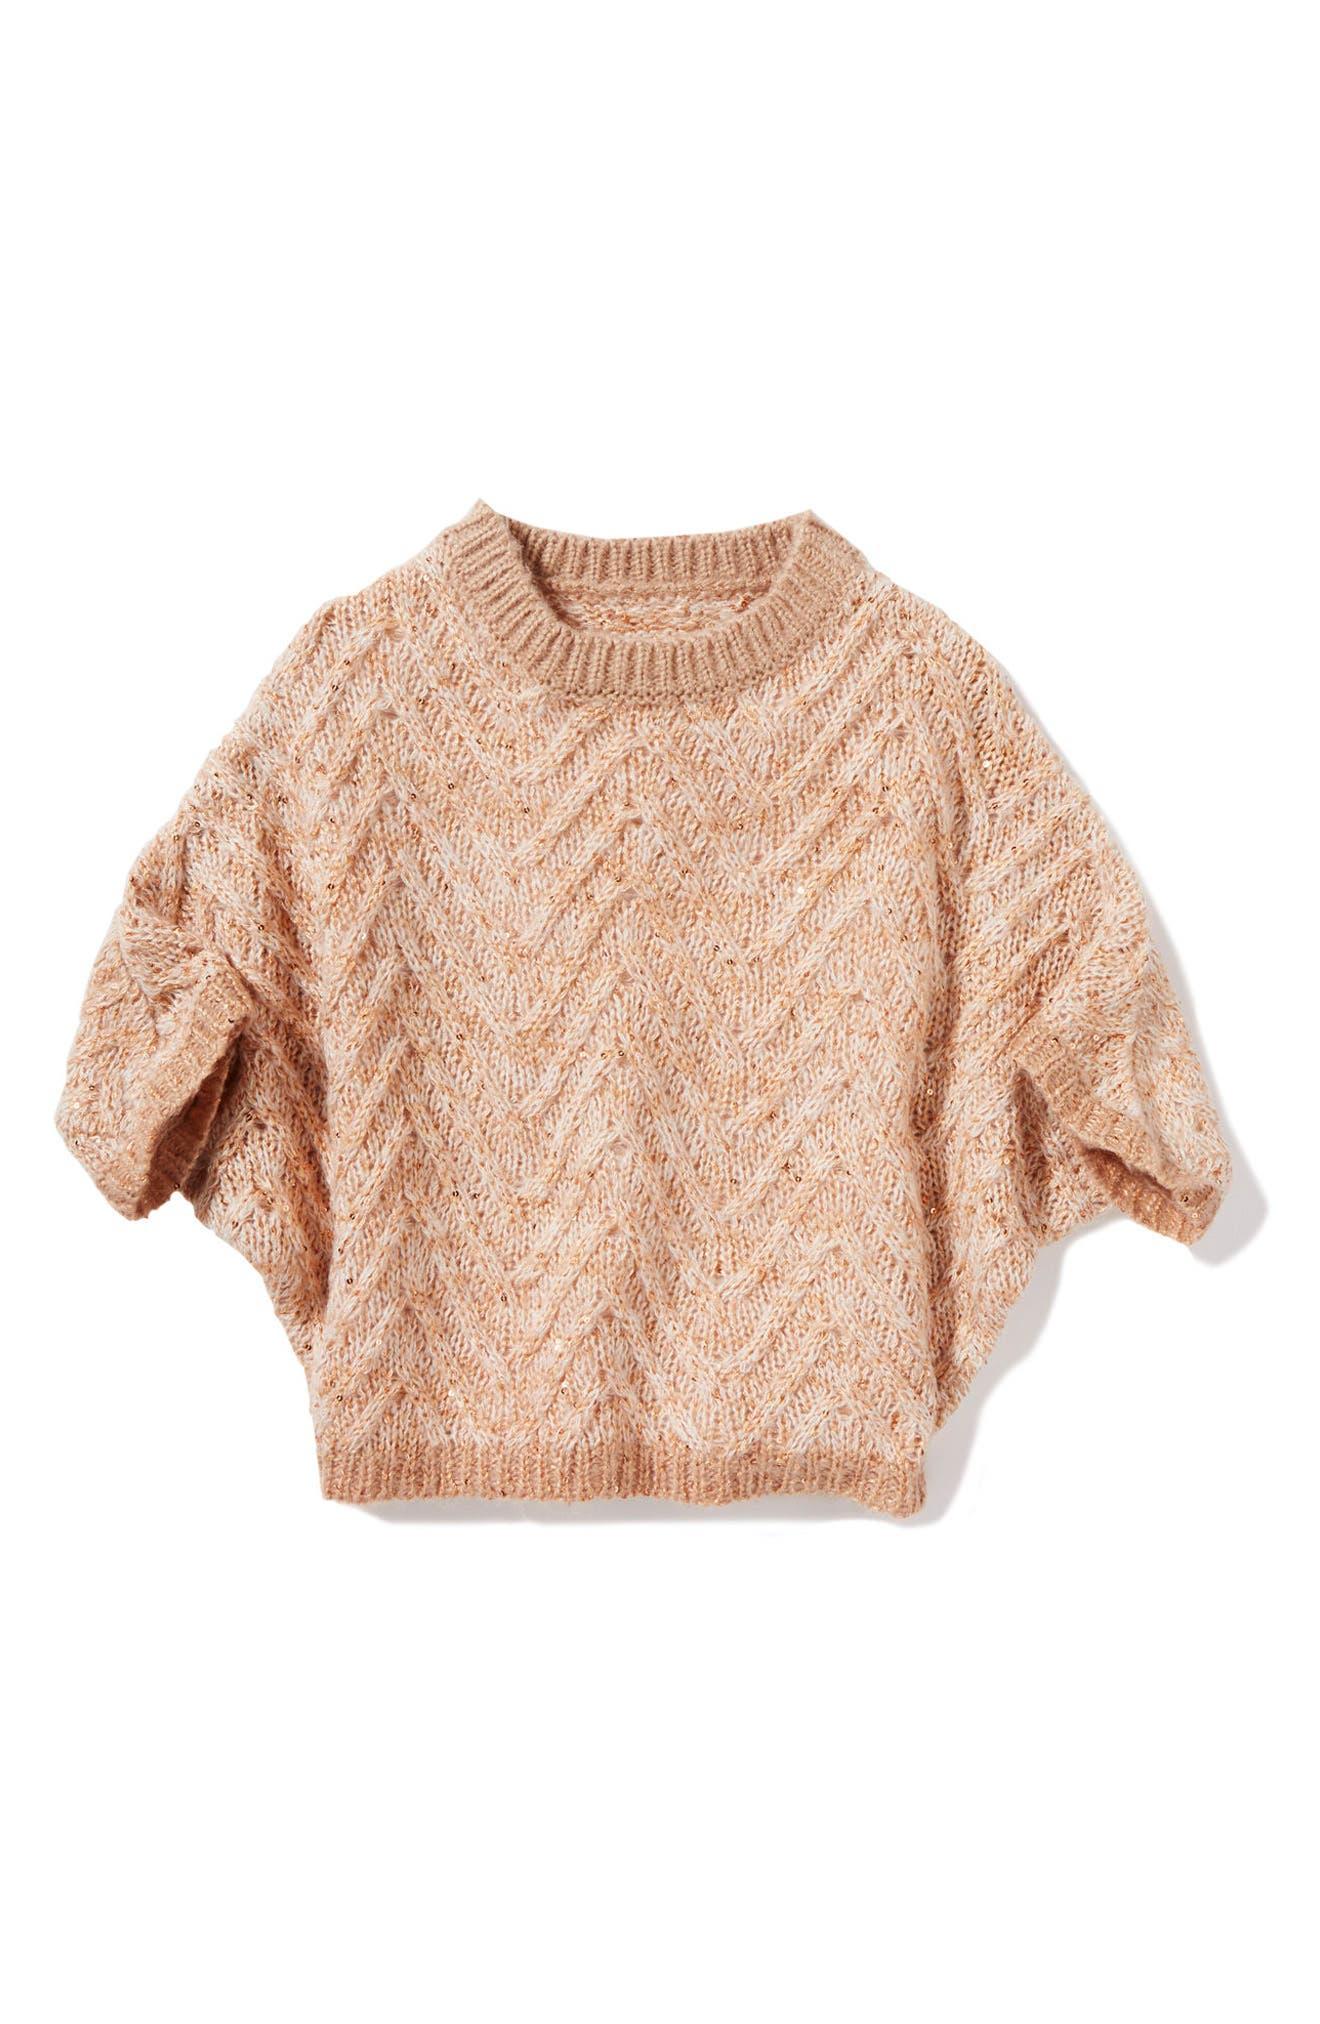 Olivia Chevron Stripe Sweater,                             Main thumbnail 1, color,                             951